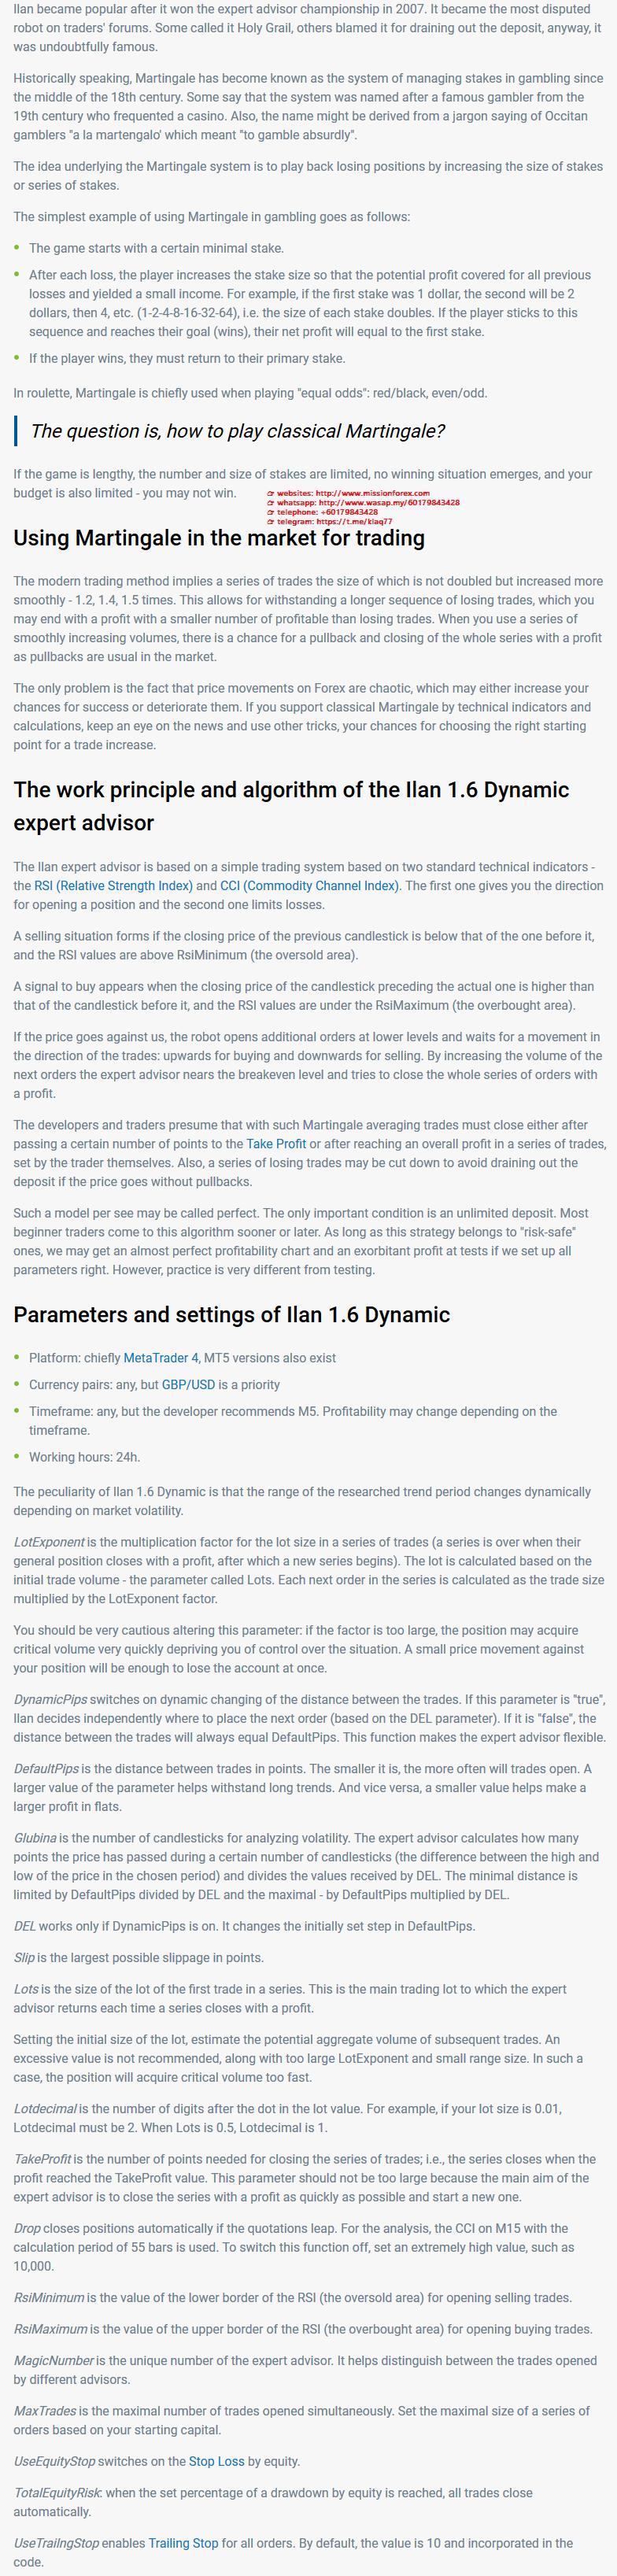 ILan Dynamic Pro EA Unlimited MT4 System Metatrader4 Expert Forex Robot Trading